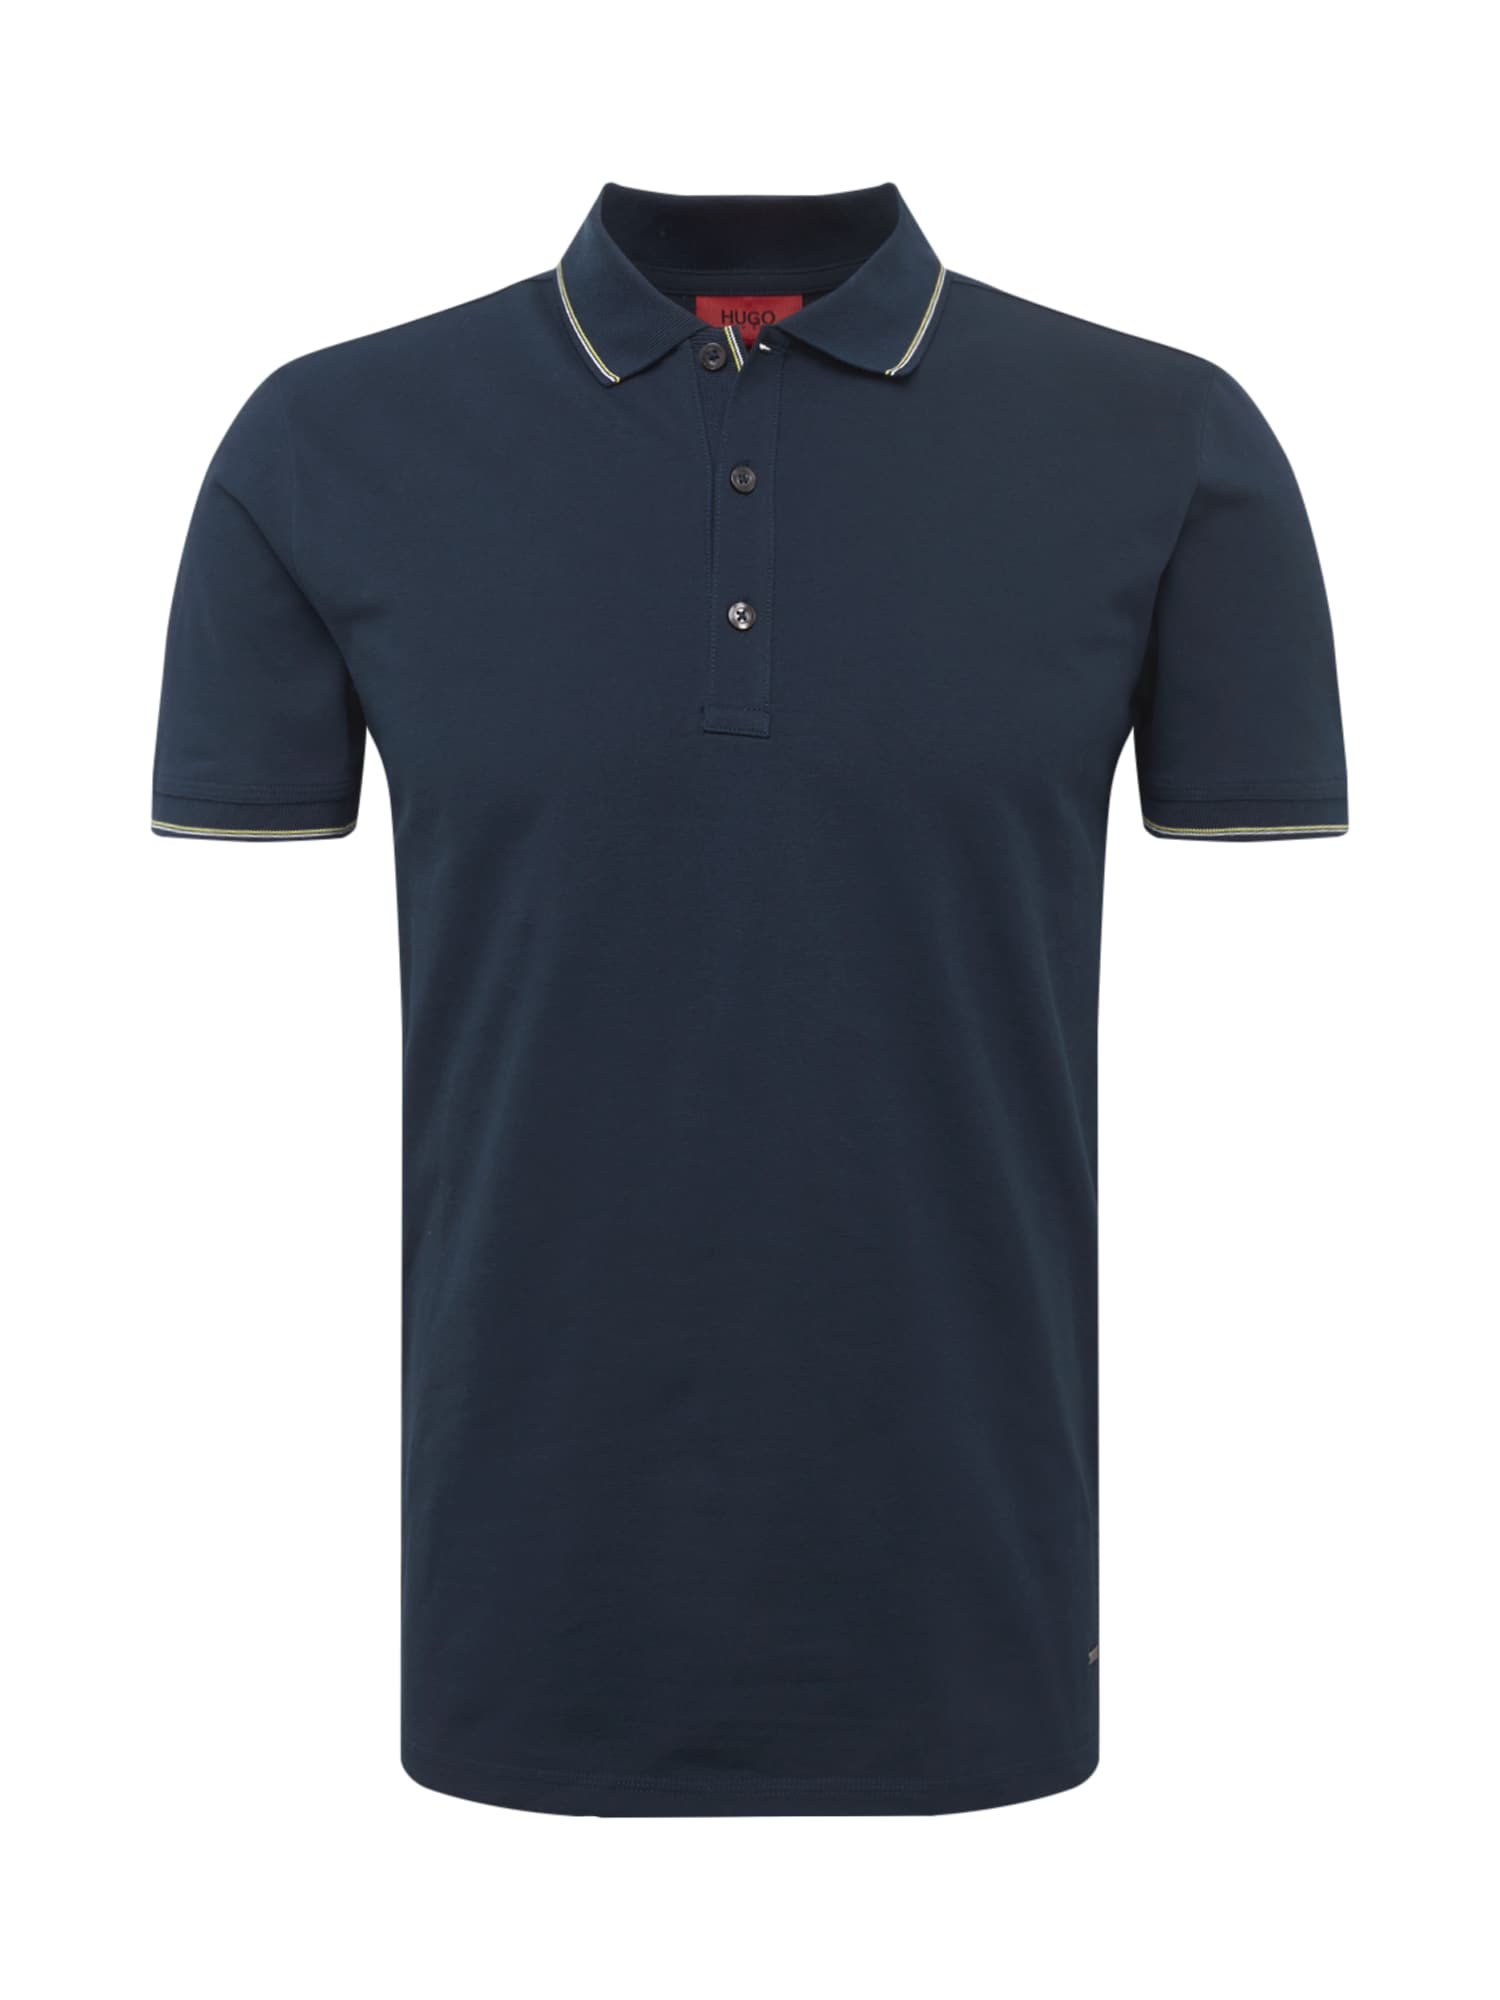 Tričko Dinoso tmavě modrá HUGO